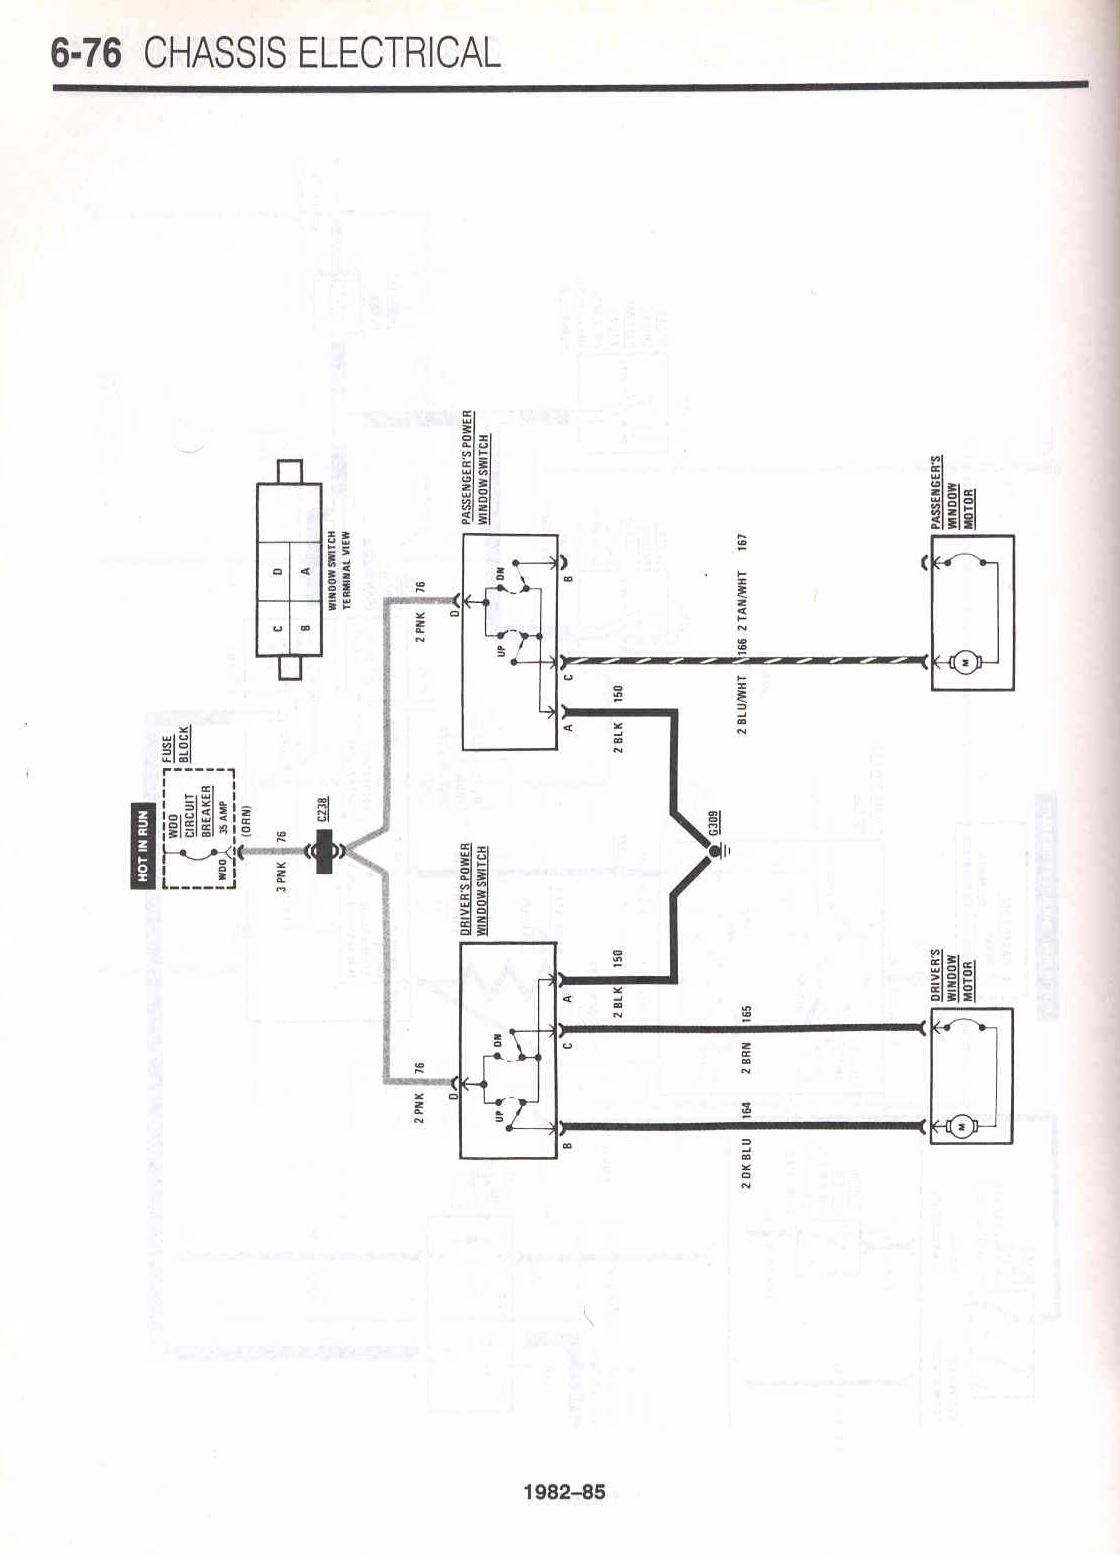 diagram] 1983 gmc wiper wiring diagram full version hd quality wiring  diagram - diagramacion.primocircoloumbertide.it  primocircoloumbertide.it